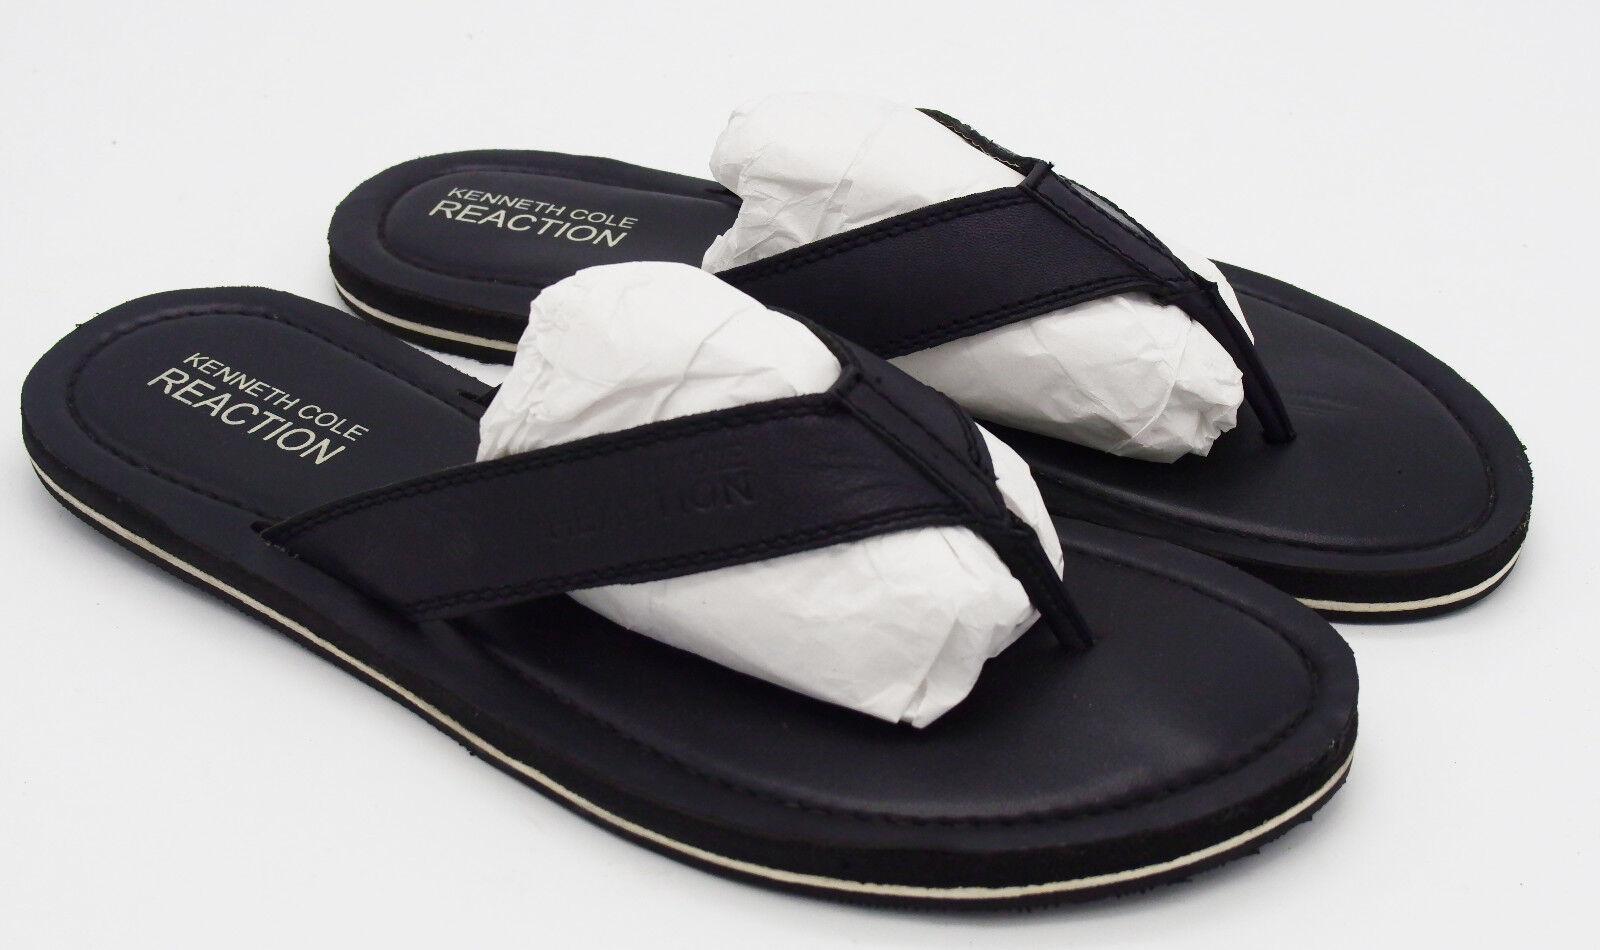 J4948 New Men's Kenneth Cole Reaction Coast Line Leather Sandal 12 M